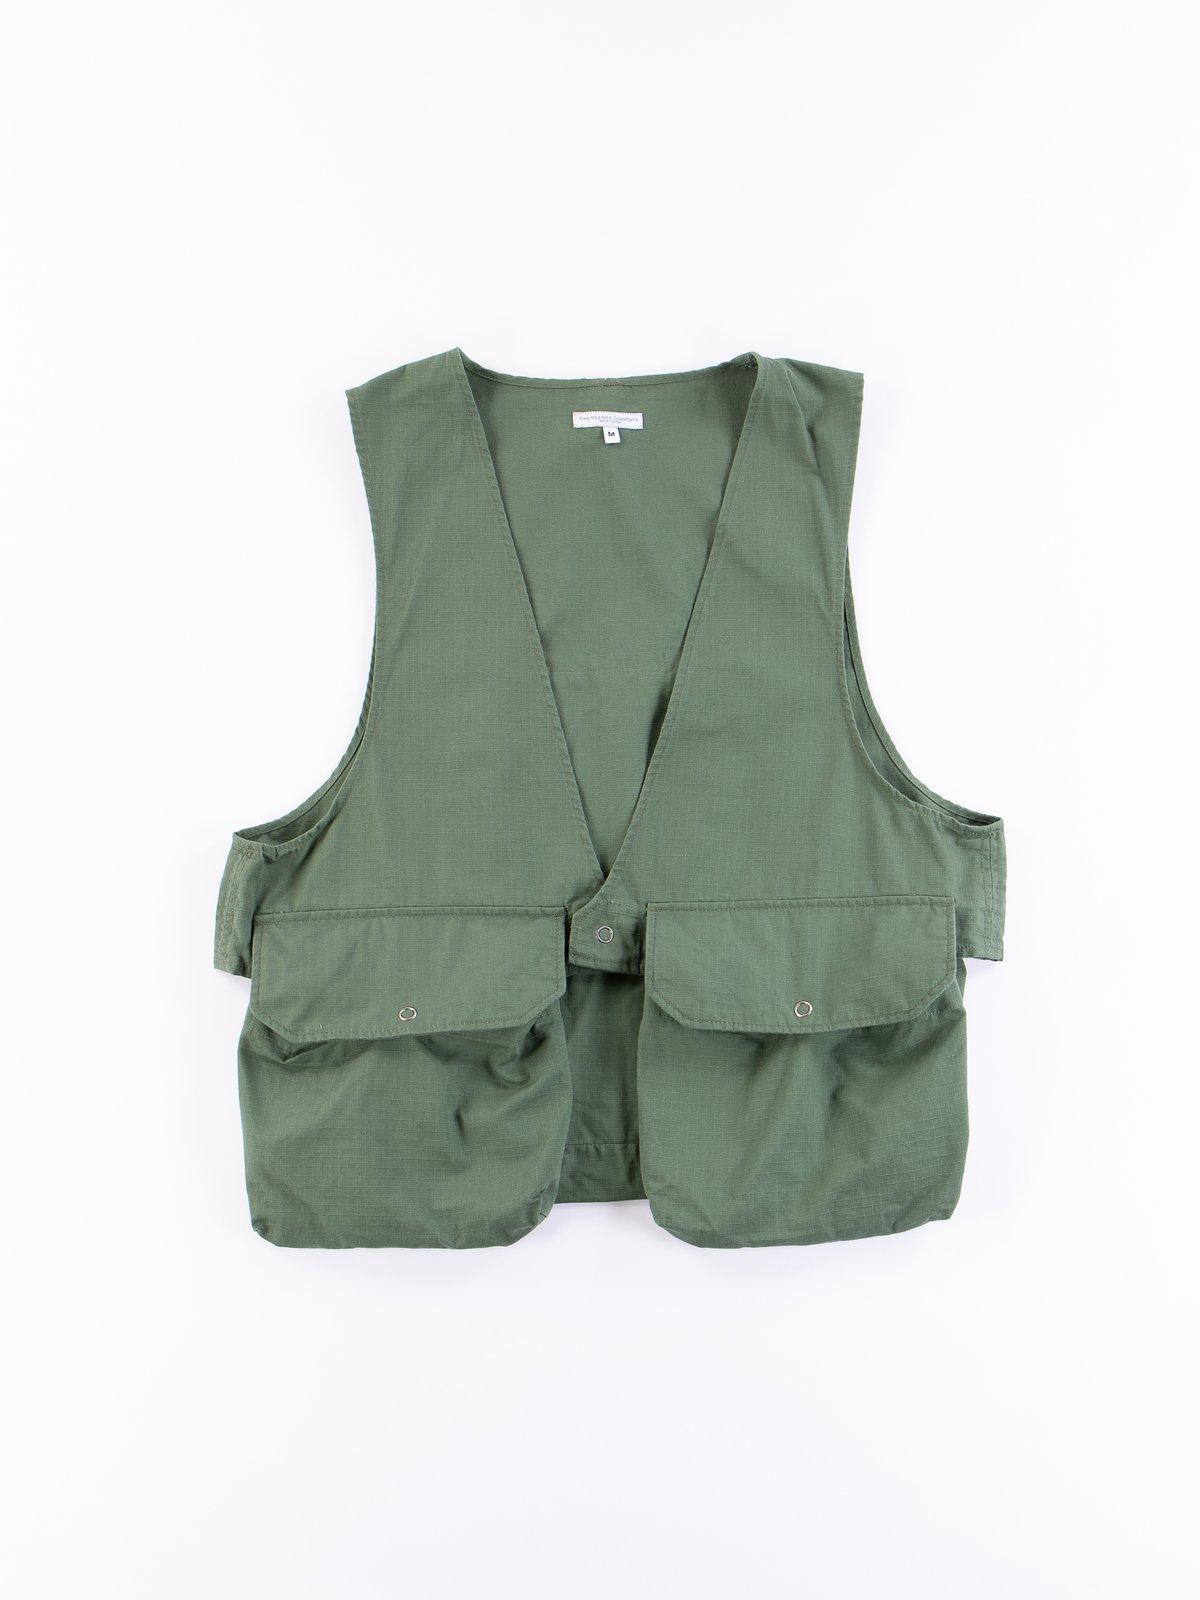 Olive Cotton Ripstop Fowl Vest - Image 1